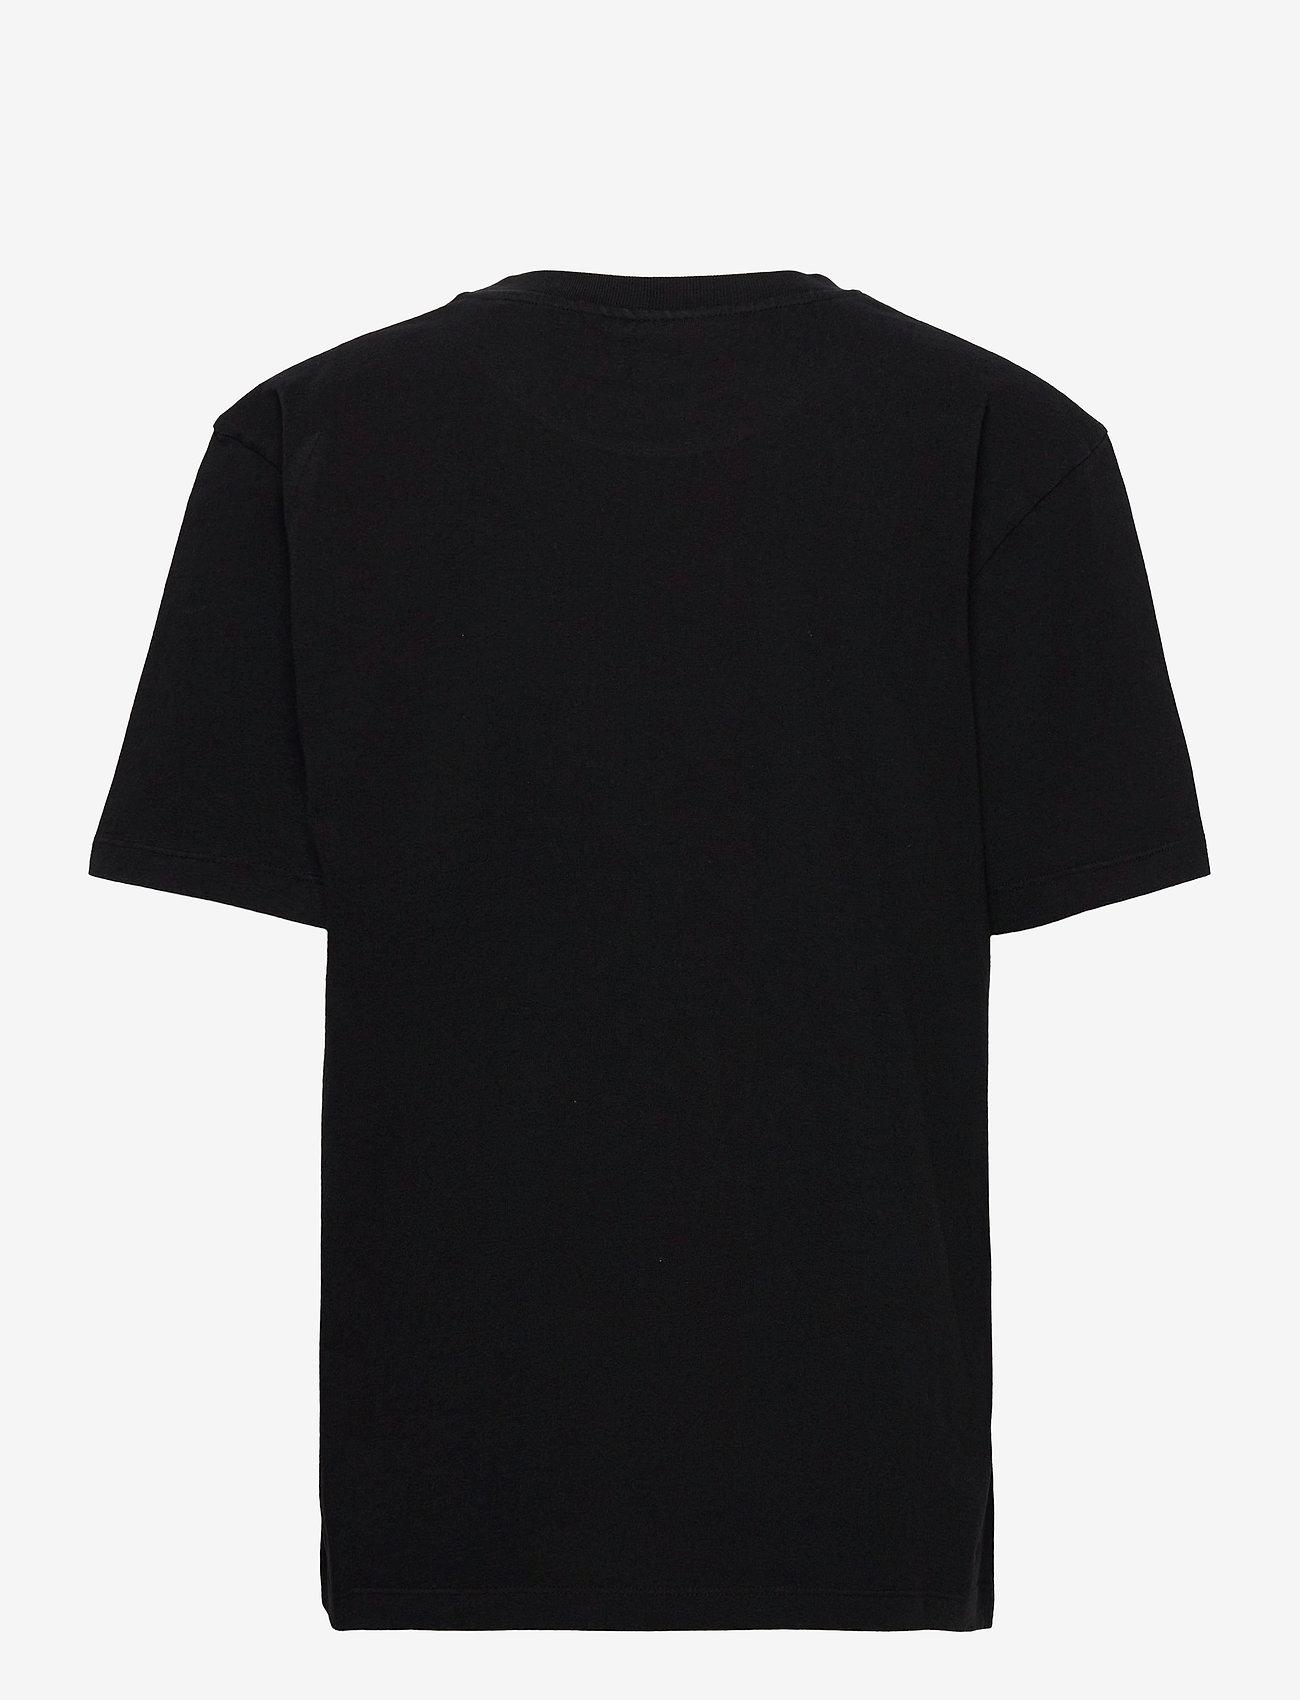 HAN Kjøbenhavn - Artwork Tee - t-shirts - faded black tribal - 1